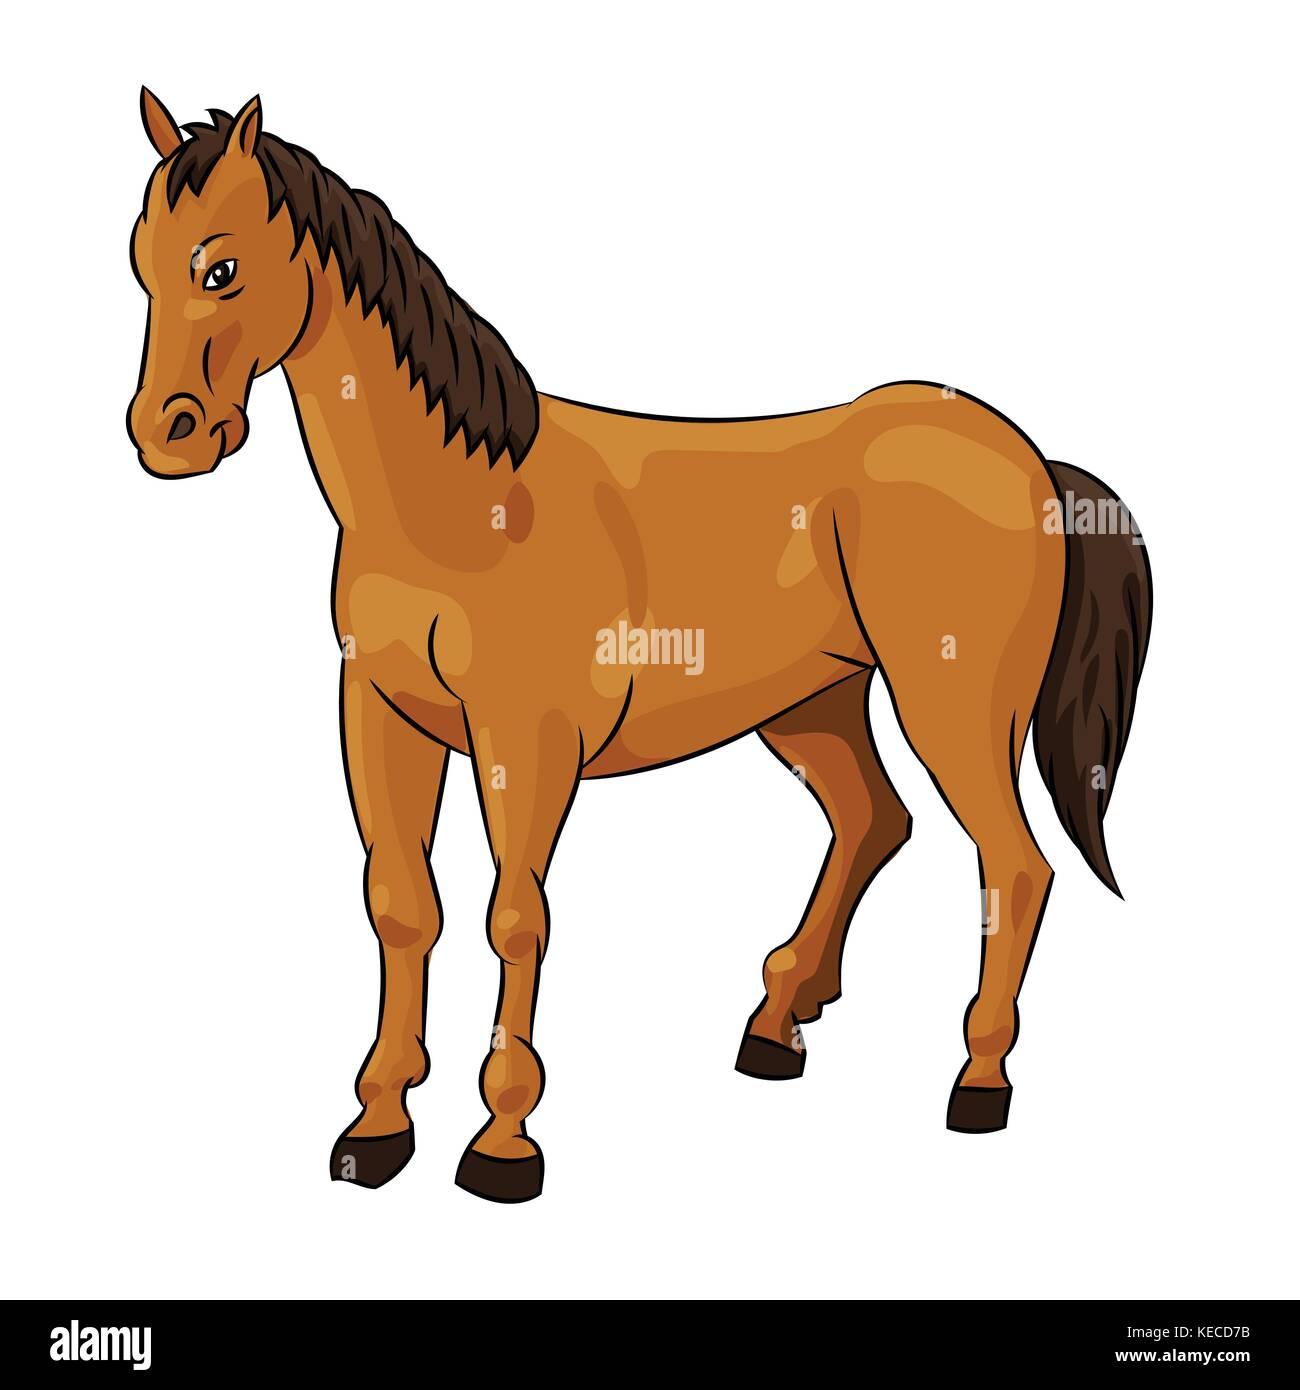 Illustration of Horse standing Isolated on white background. Children's illustration. Vector. - Stock Image